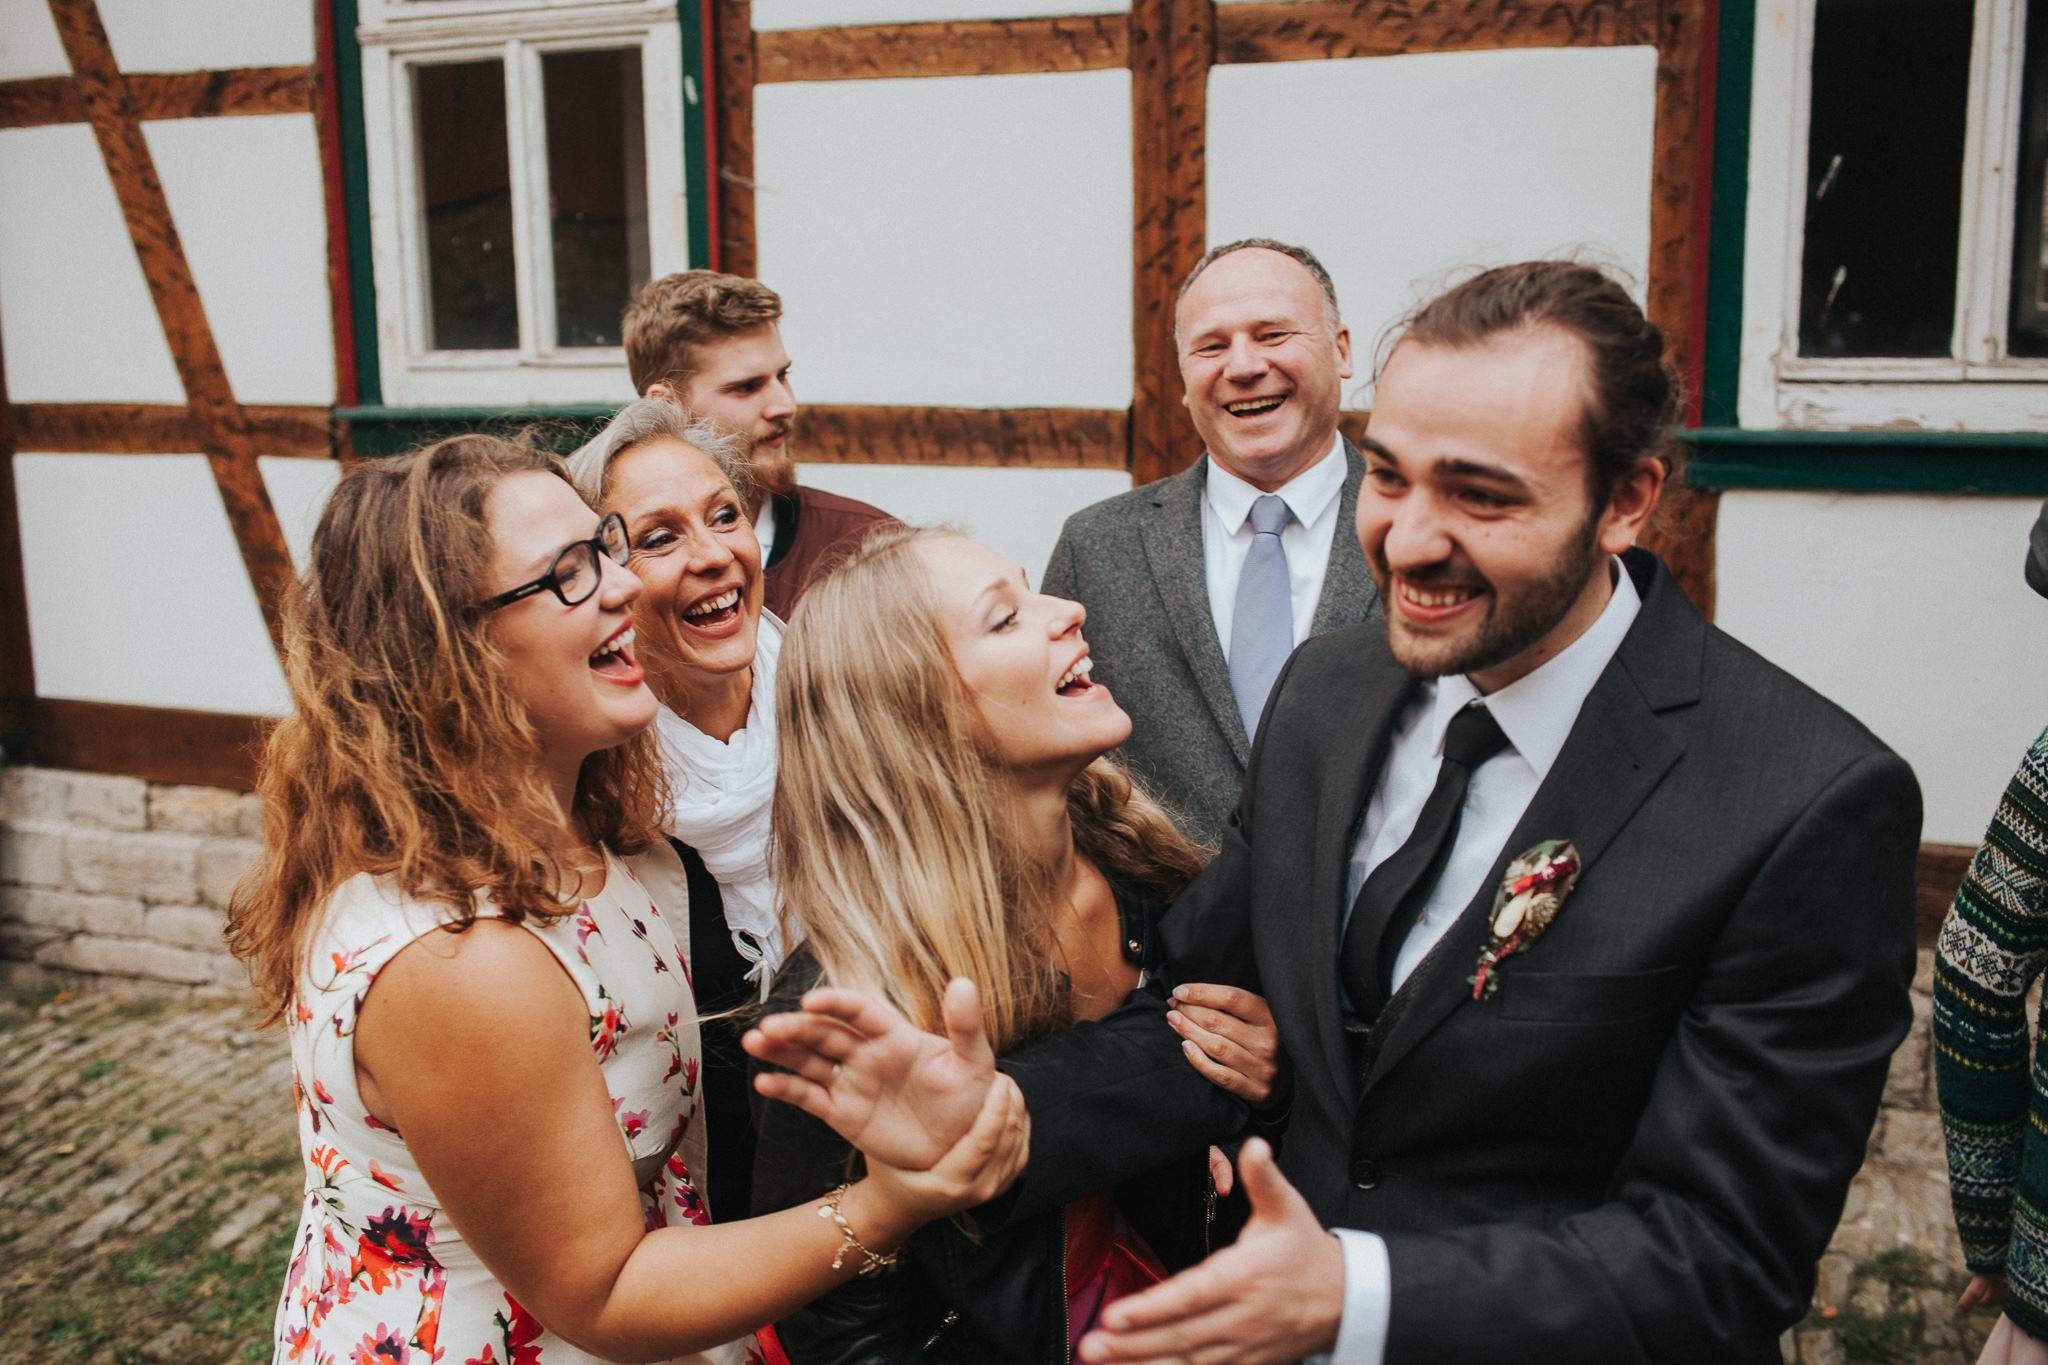 Familie des Bräutigams lacht